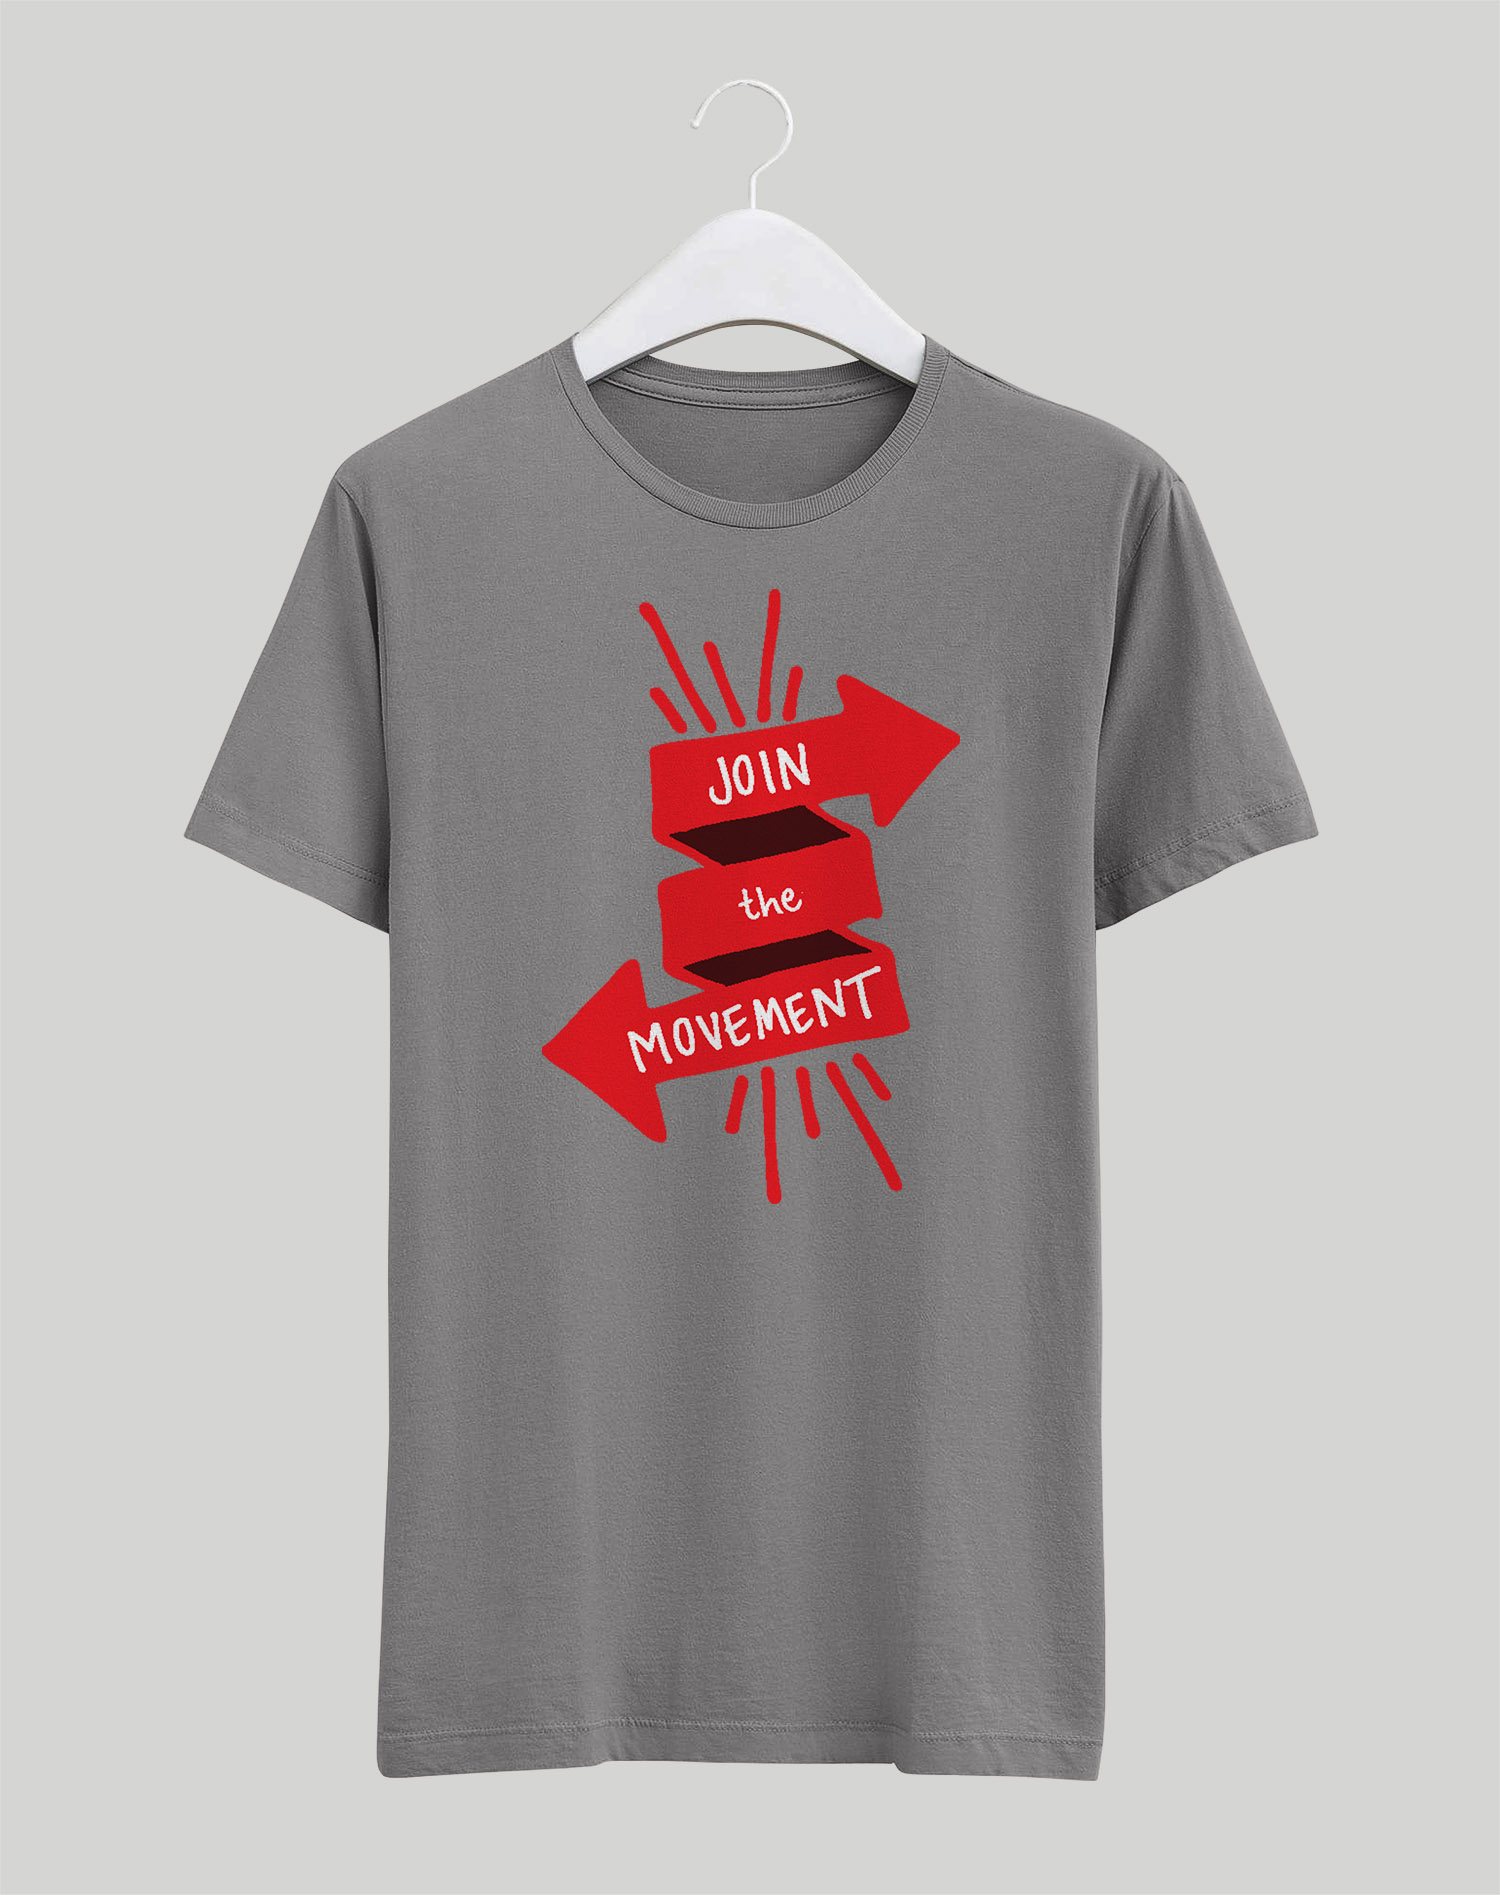 Join the Movement T-shirt Mockup.jpg